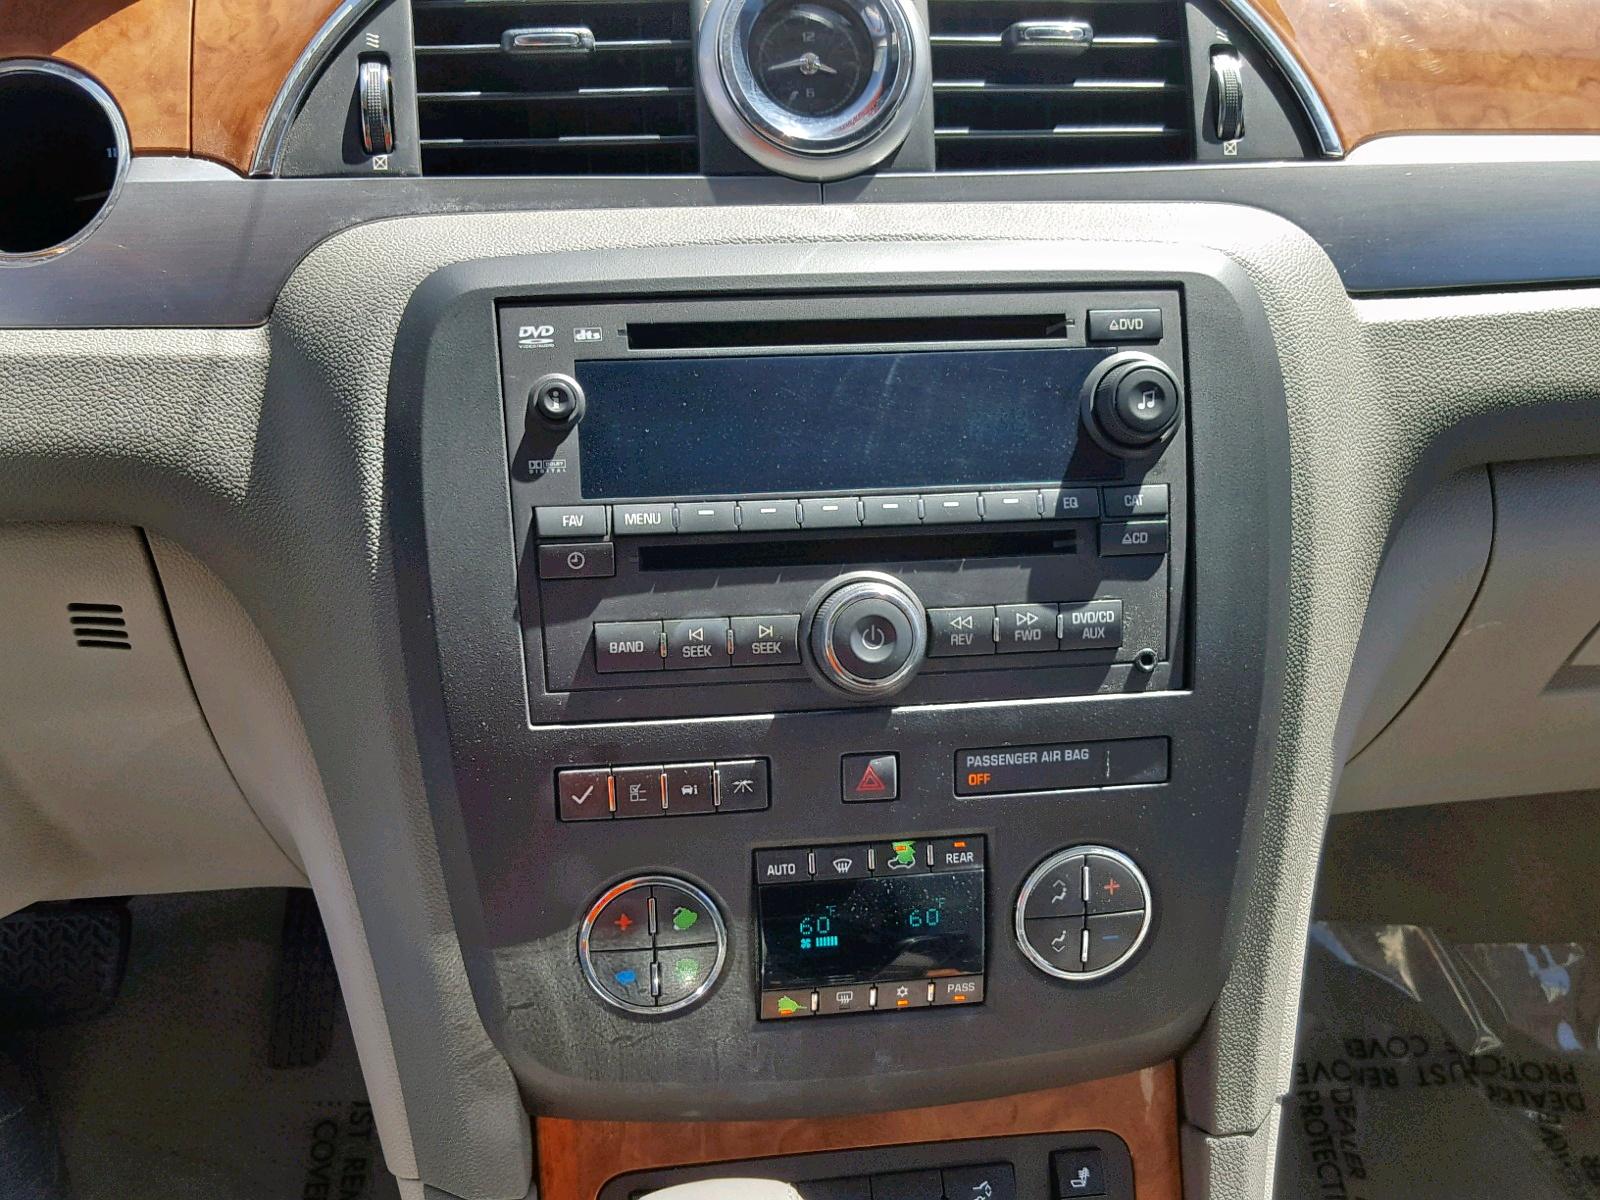 5GAKVCED1CJ321648 - 2012 Buick Enclave 3.6L engine view